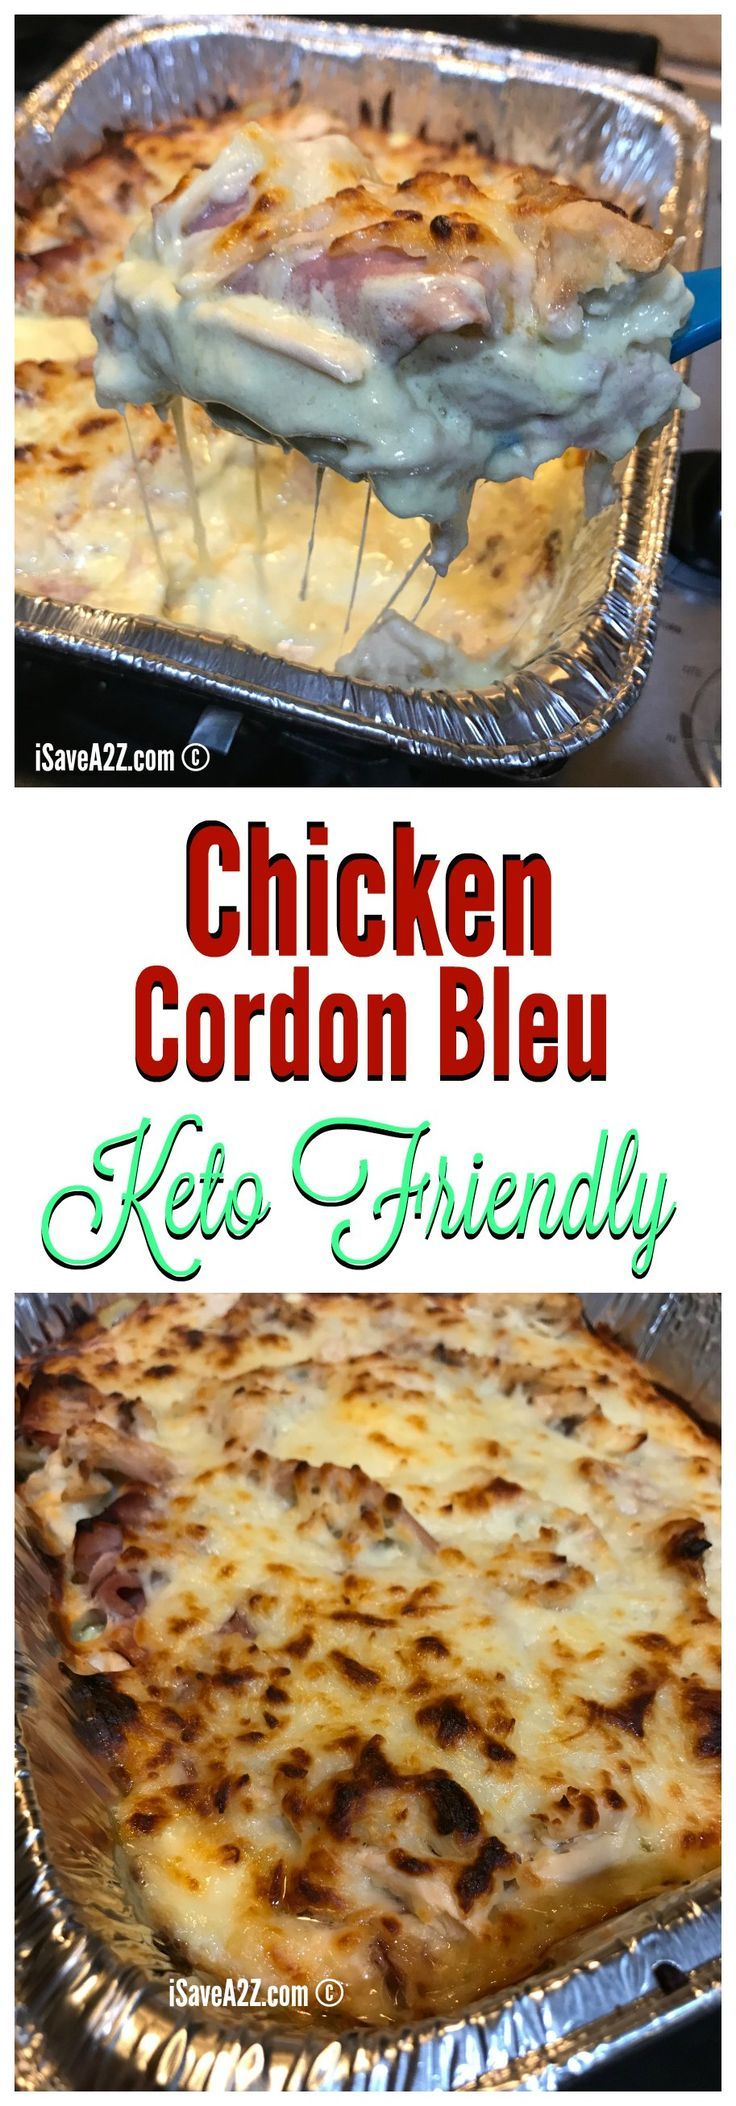 Chicken Cordon Bleu Casserole Keto Friendly Recipe  Keto -2220